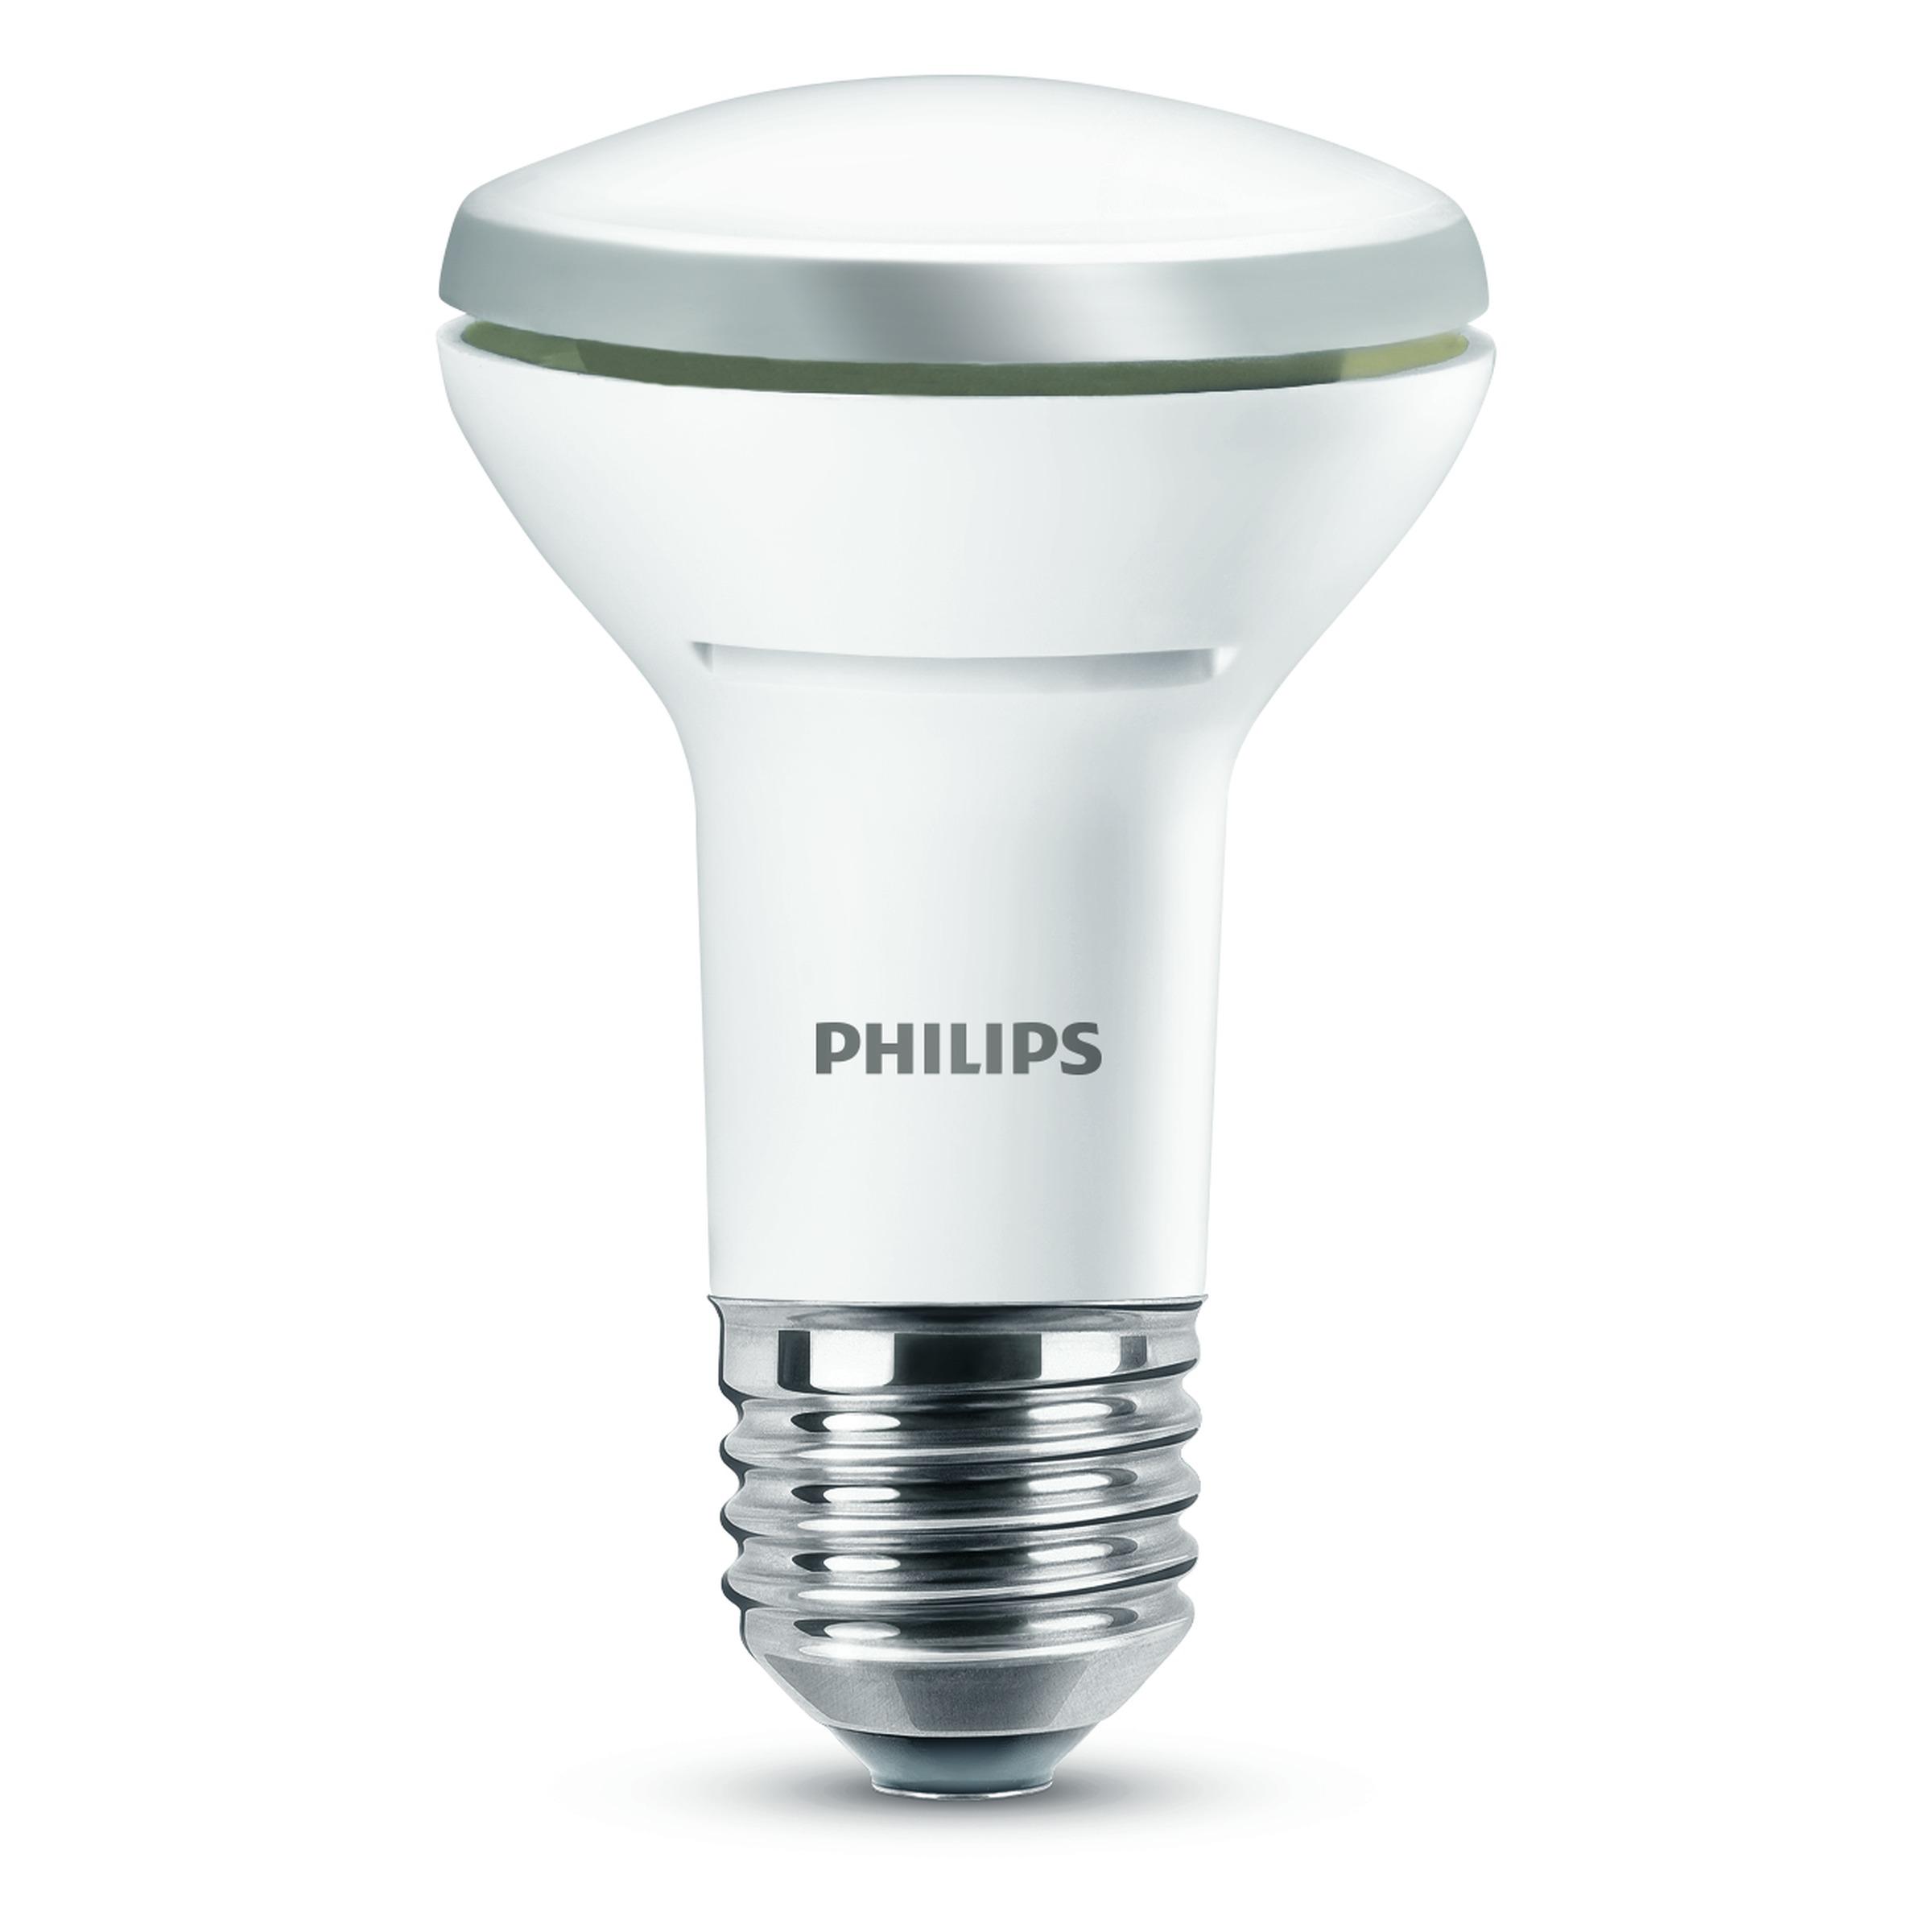 Philips led reflectorlamp e27 345 lumen 5 7w 60w dimbaar for Lampen philips